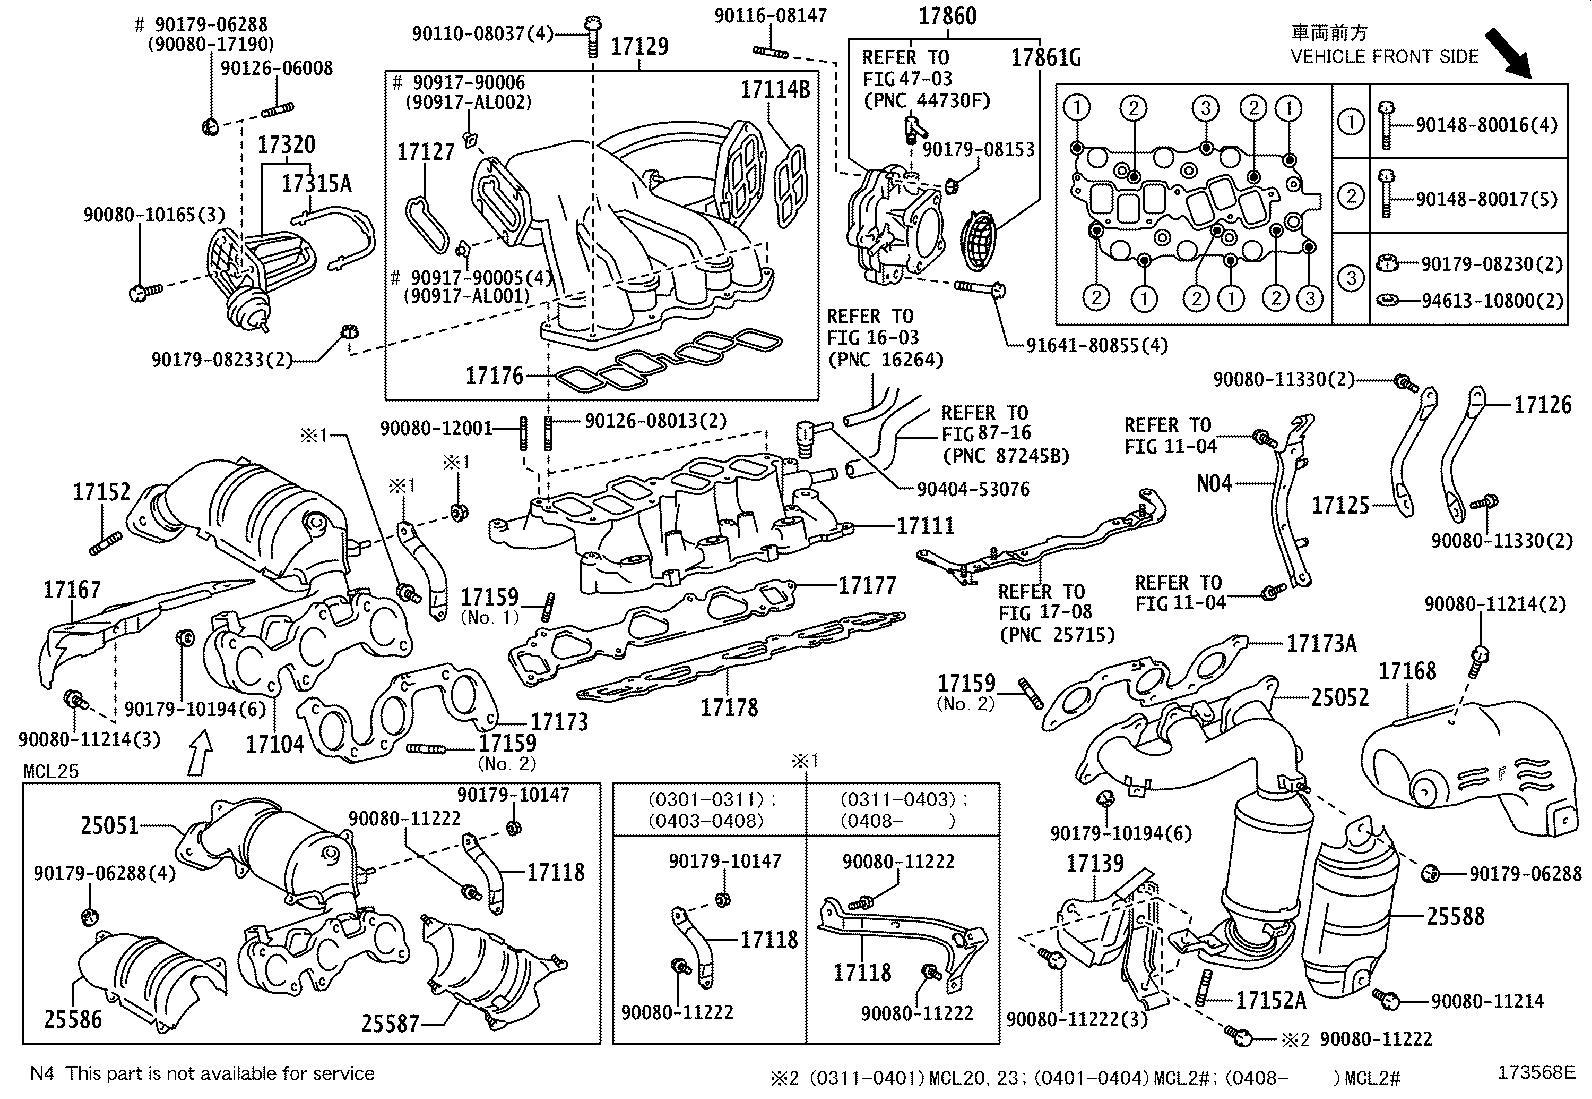 2008 Toyota Sienna Gasket  Air Surge Tank To Intake Manifold  Spec  California  Exhaust